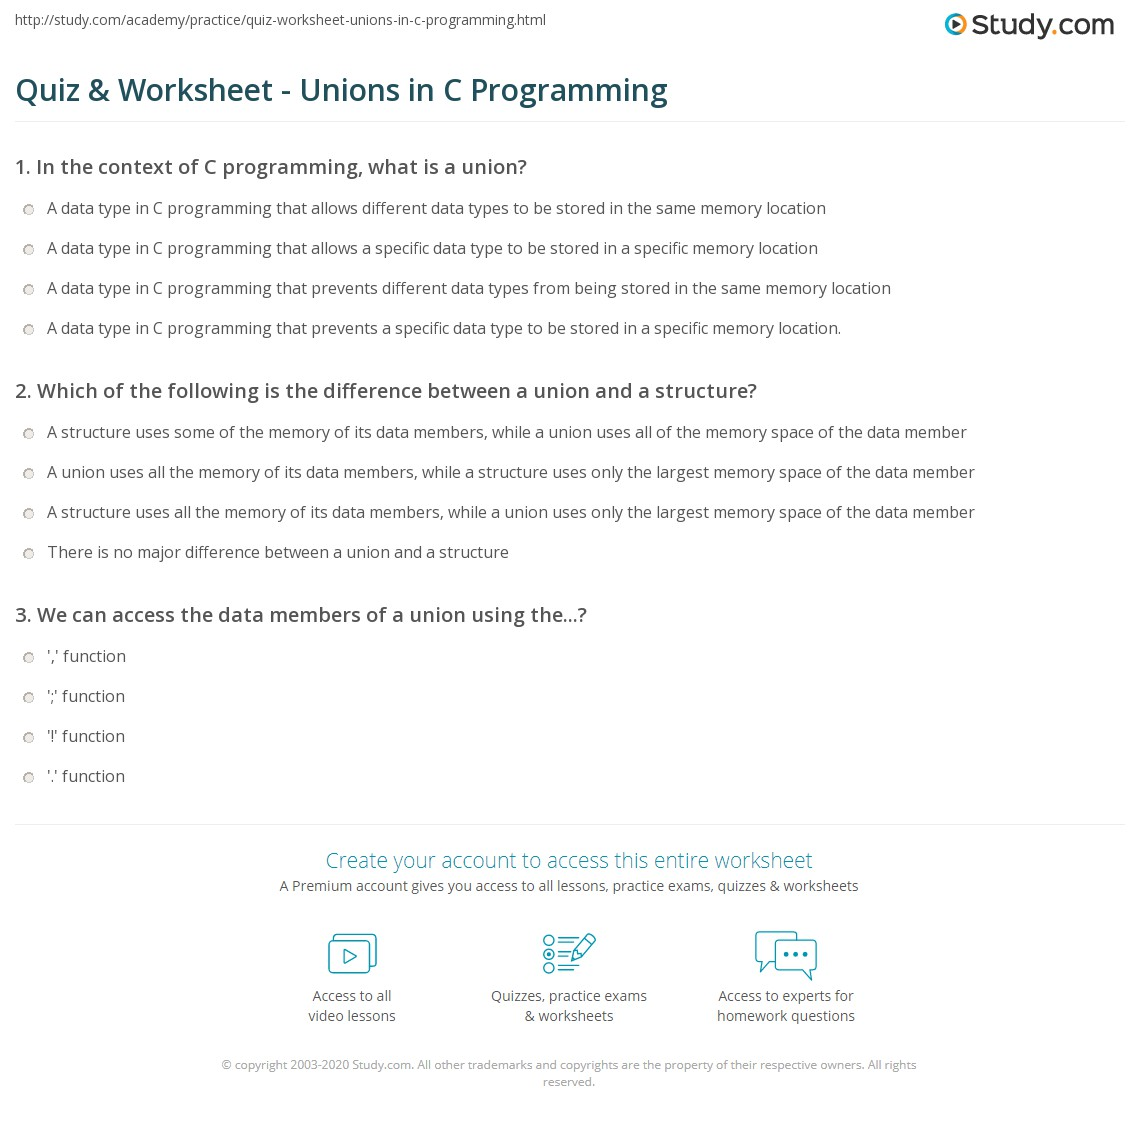 Quiz & Worksheet - Unions in C Programming | Study.com